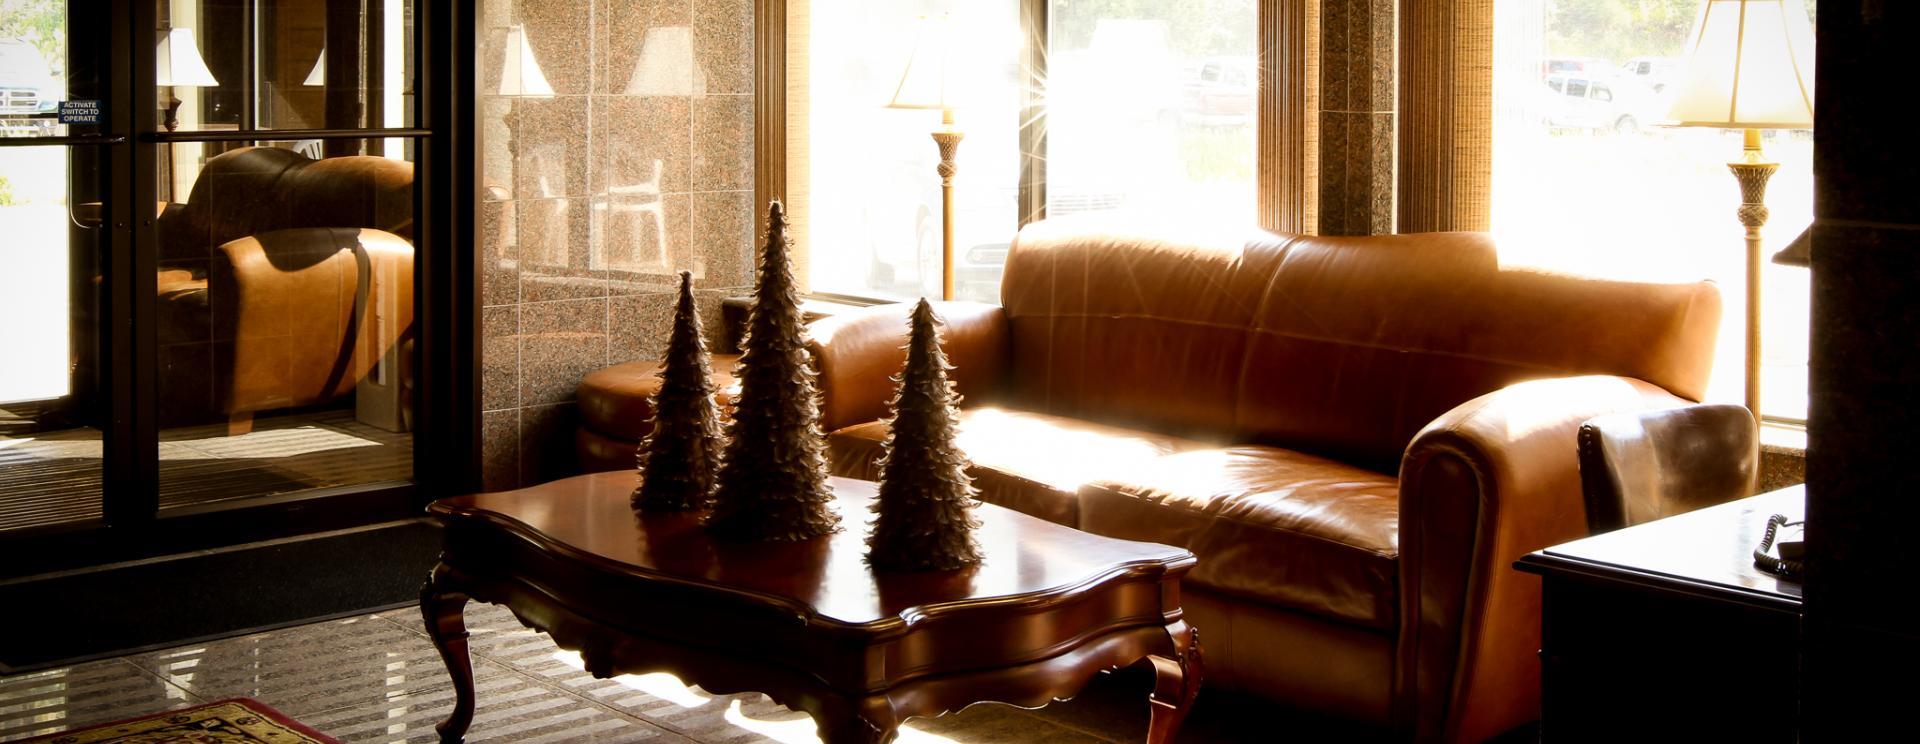 Rushmore Express Inn & Family Suites